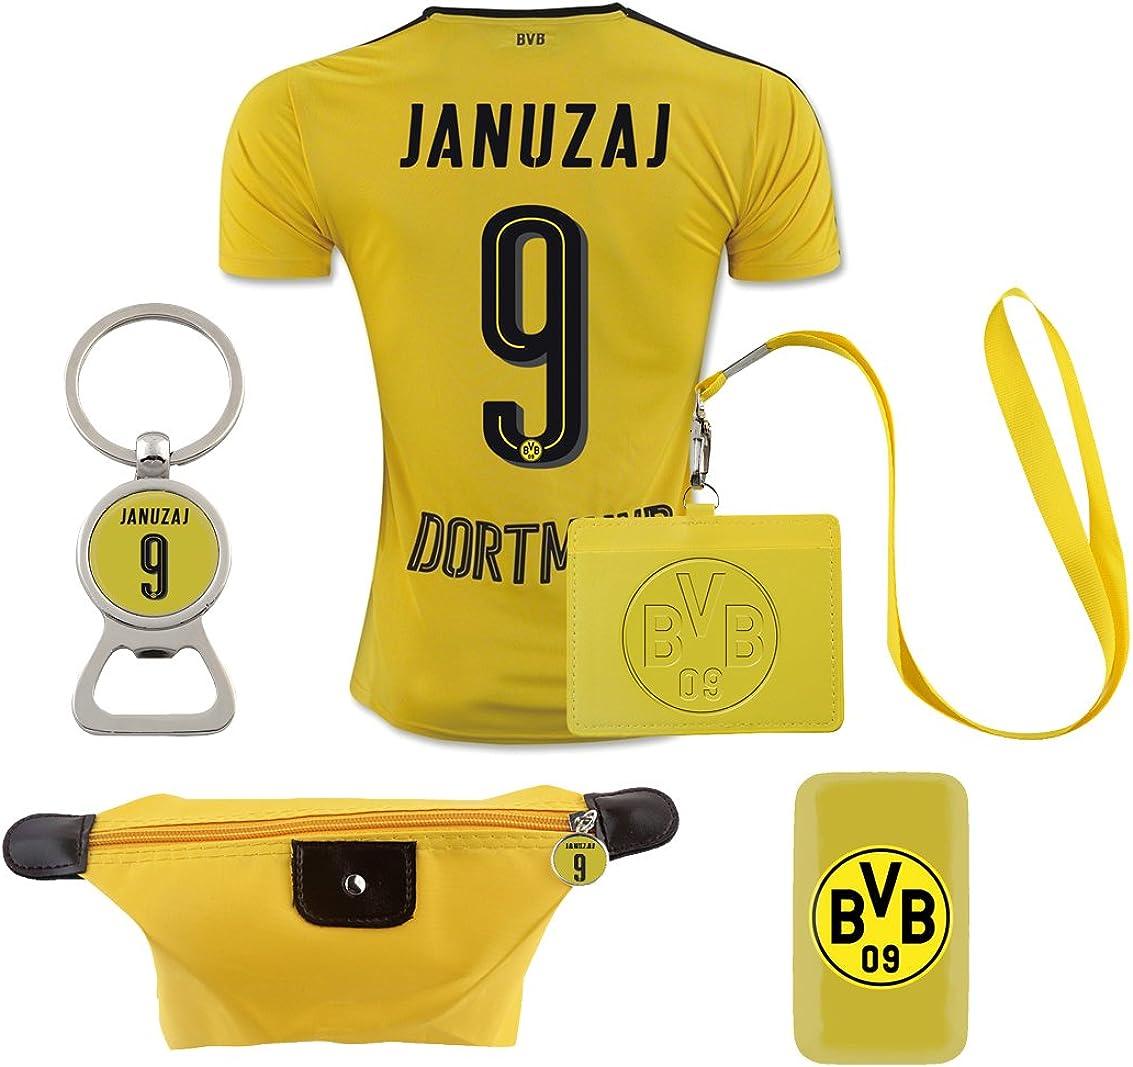 #9 Januzaj (6 in 1 Combo) Dortmund Home Match Adult Soccer Jersey 2016-17